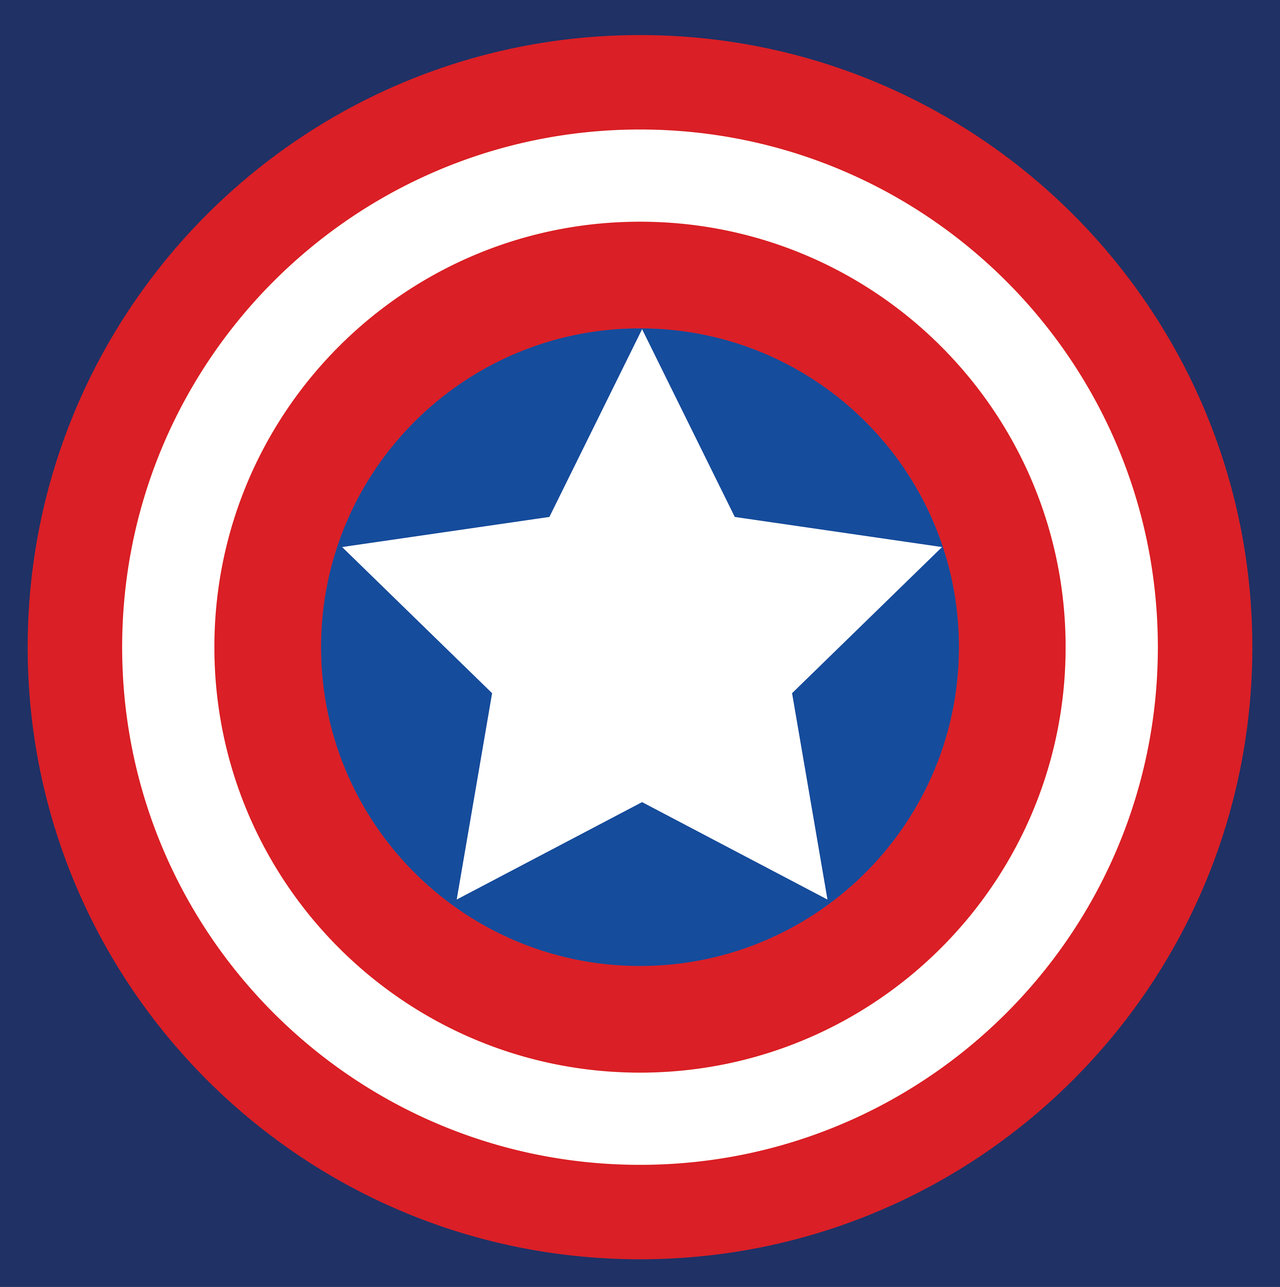 captain america shield wallpaper hd wallpapersafari. Black Bedroom Furniture Sets. Home Design Ideas